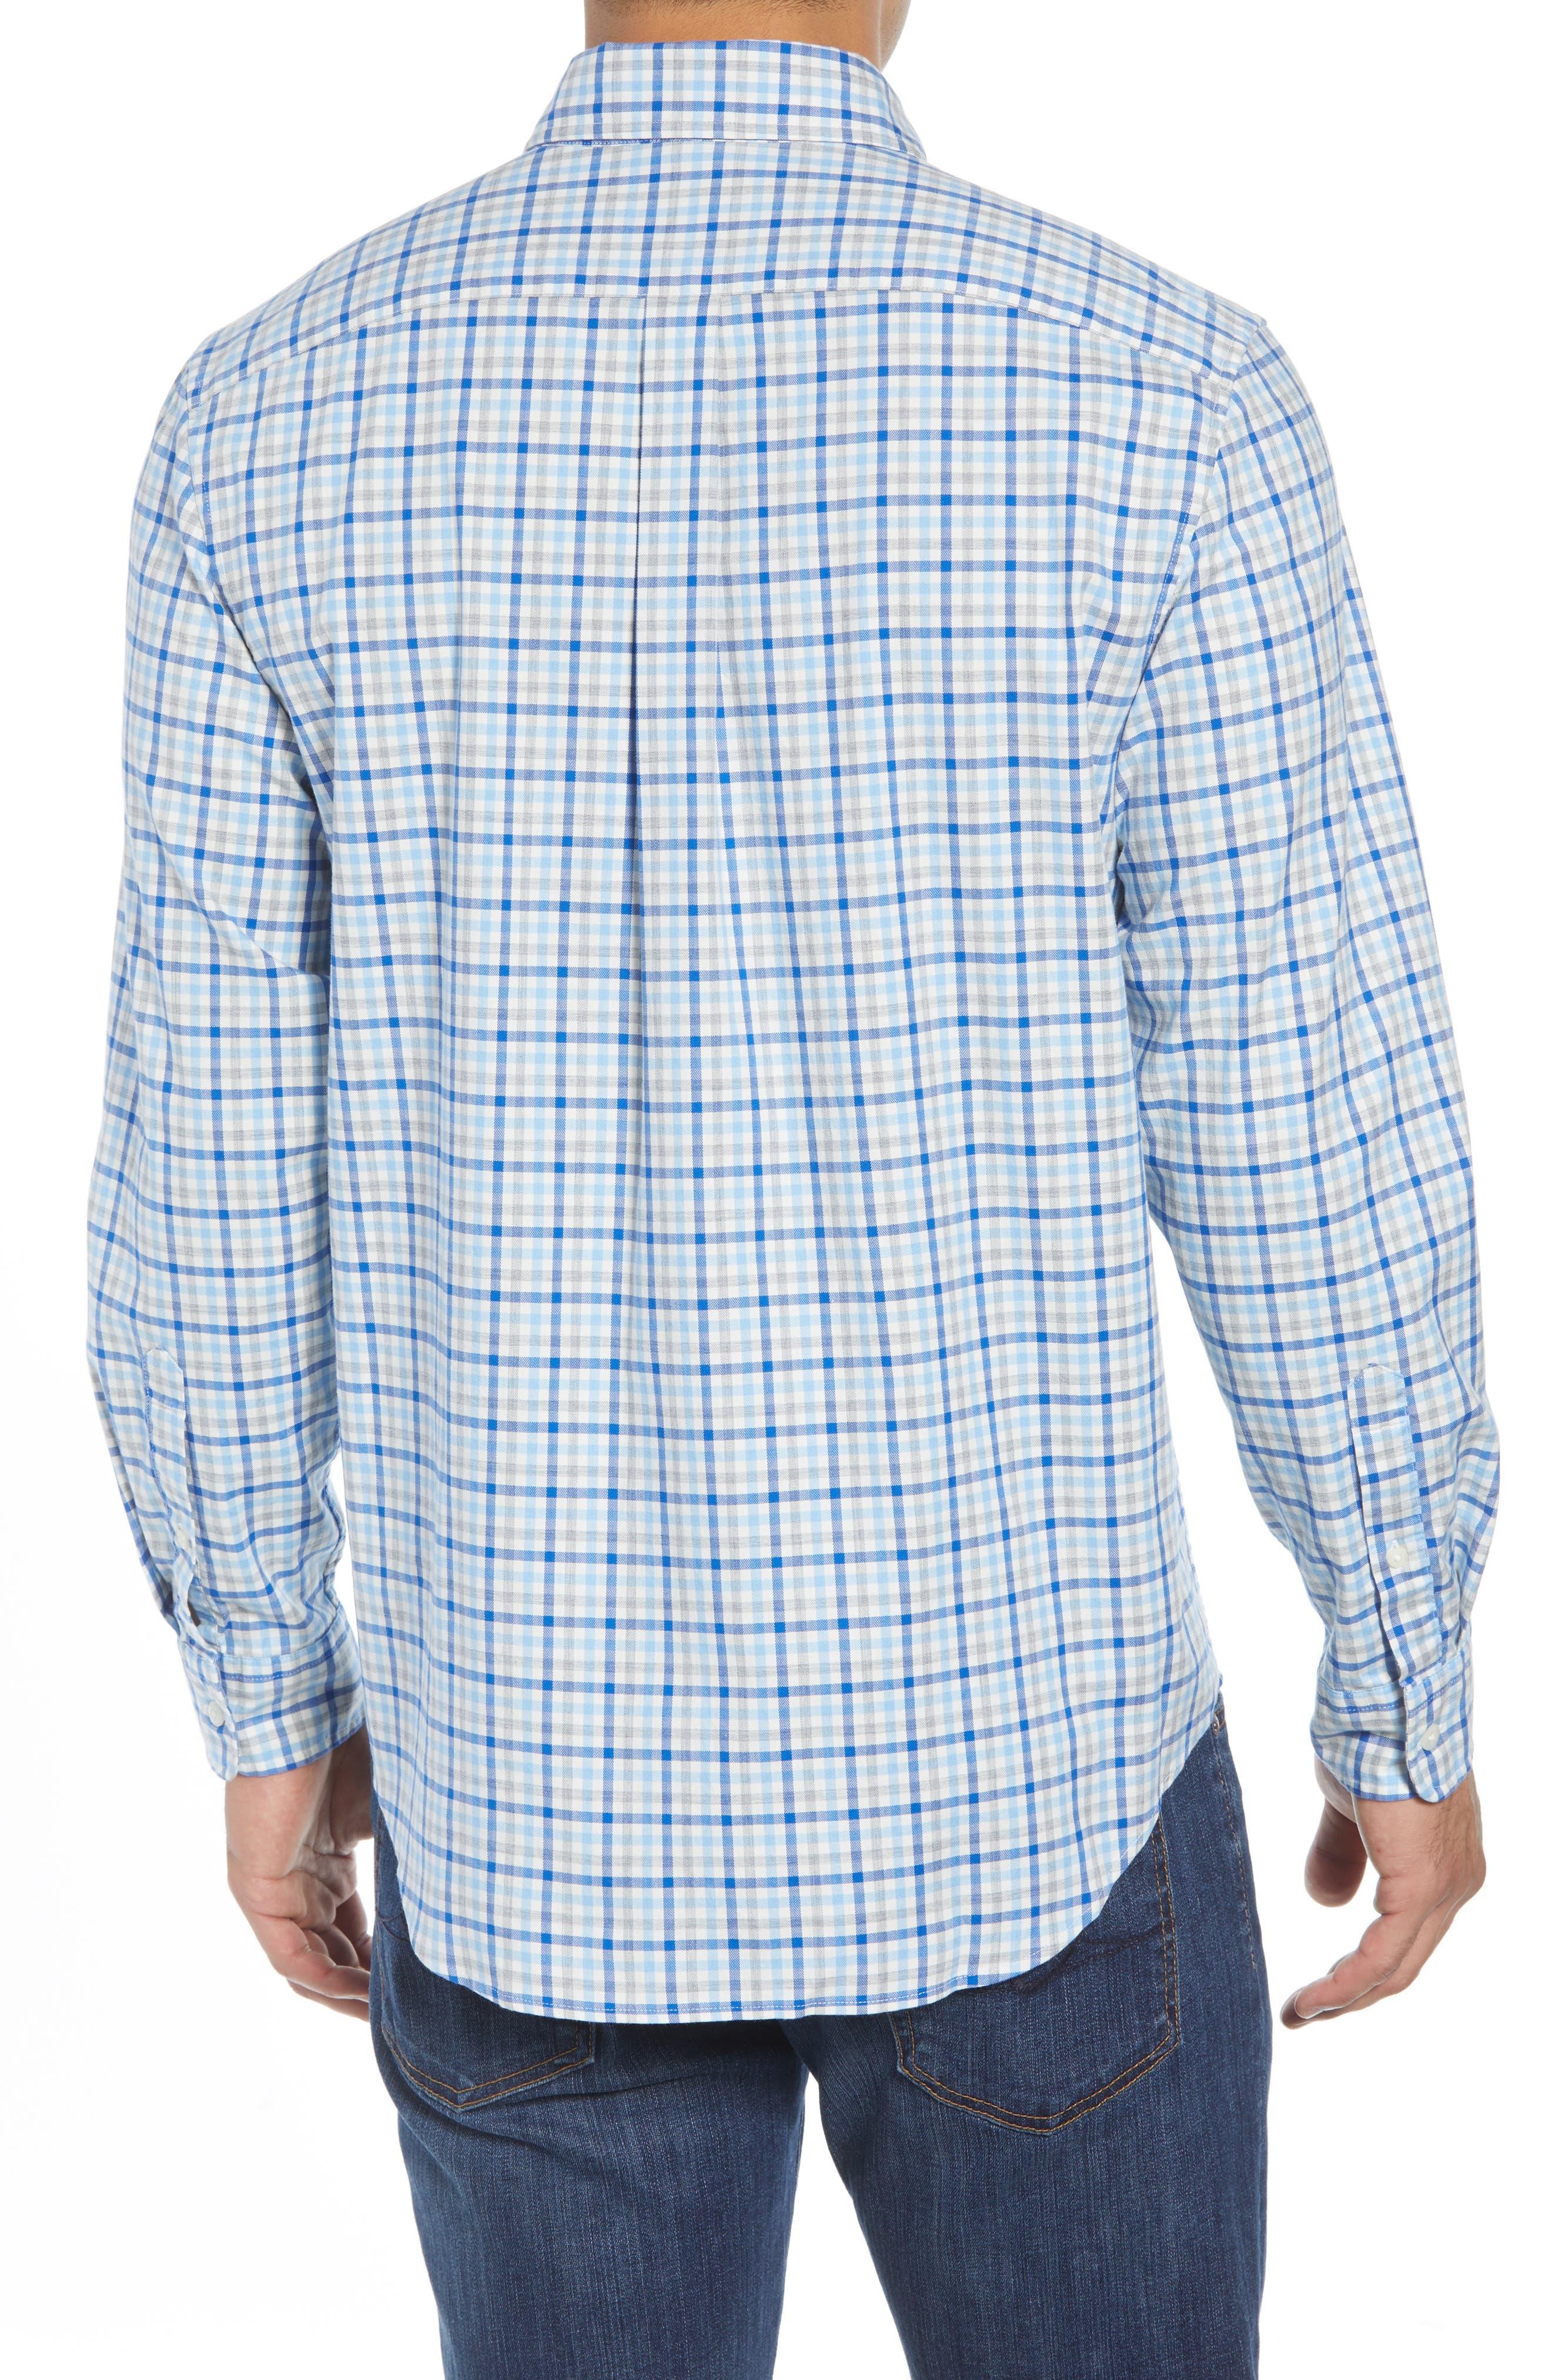 Pondview Regular Fit Check Sport Shirt,                             Alternate thumbnail 3, color,                             484